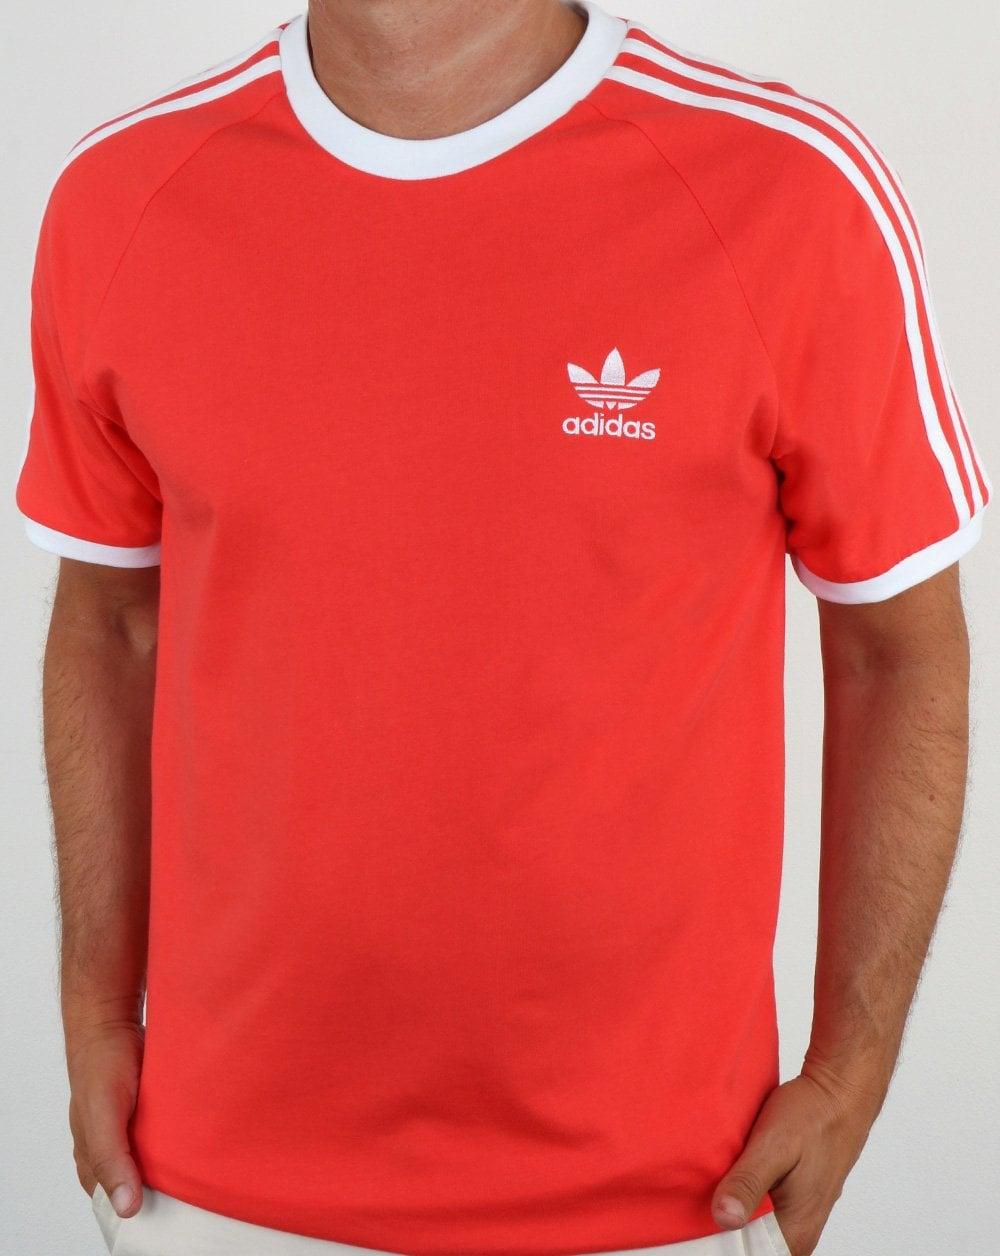 adidas b shirt